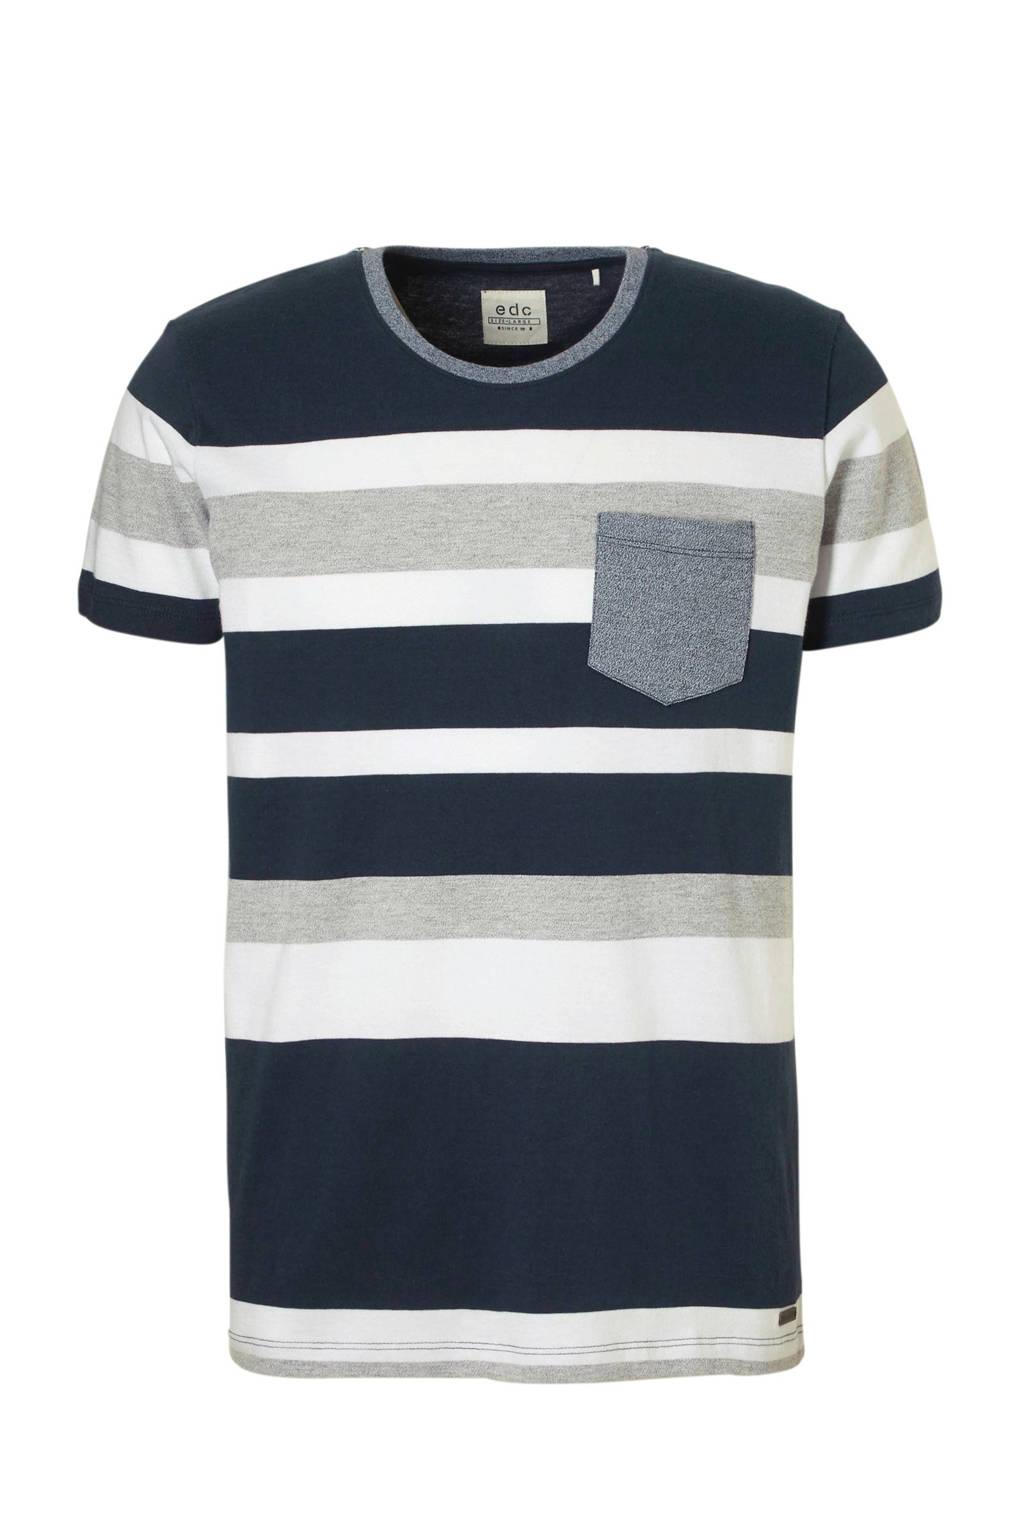 edc Men T-shirt, Donkerblauw